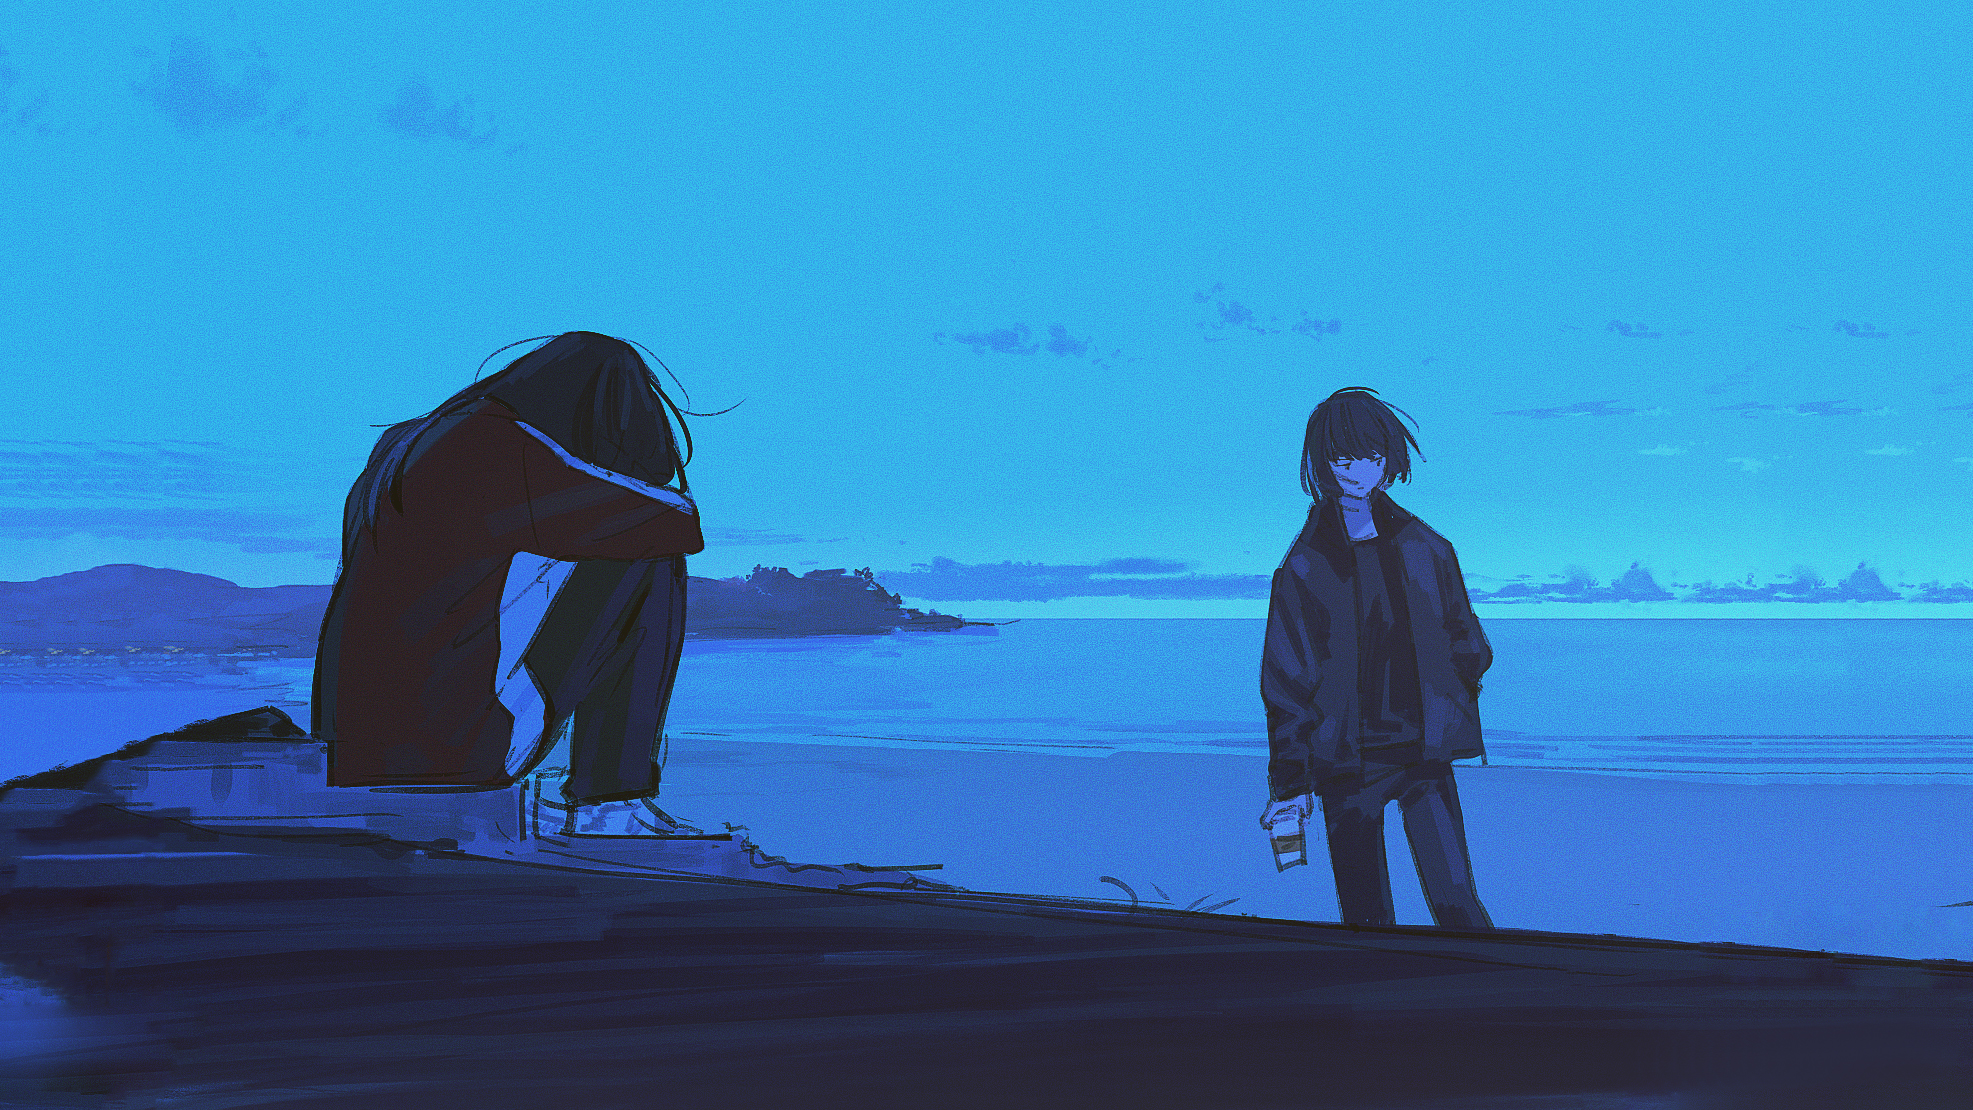 Anime 1973x1110 beach digital art blue sad landscape sea cyan minimalism simple